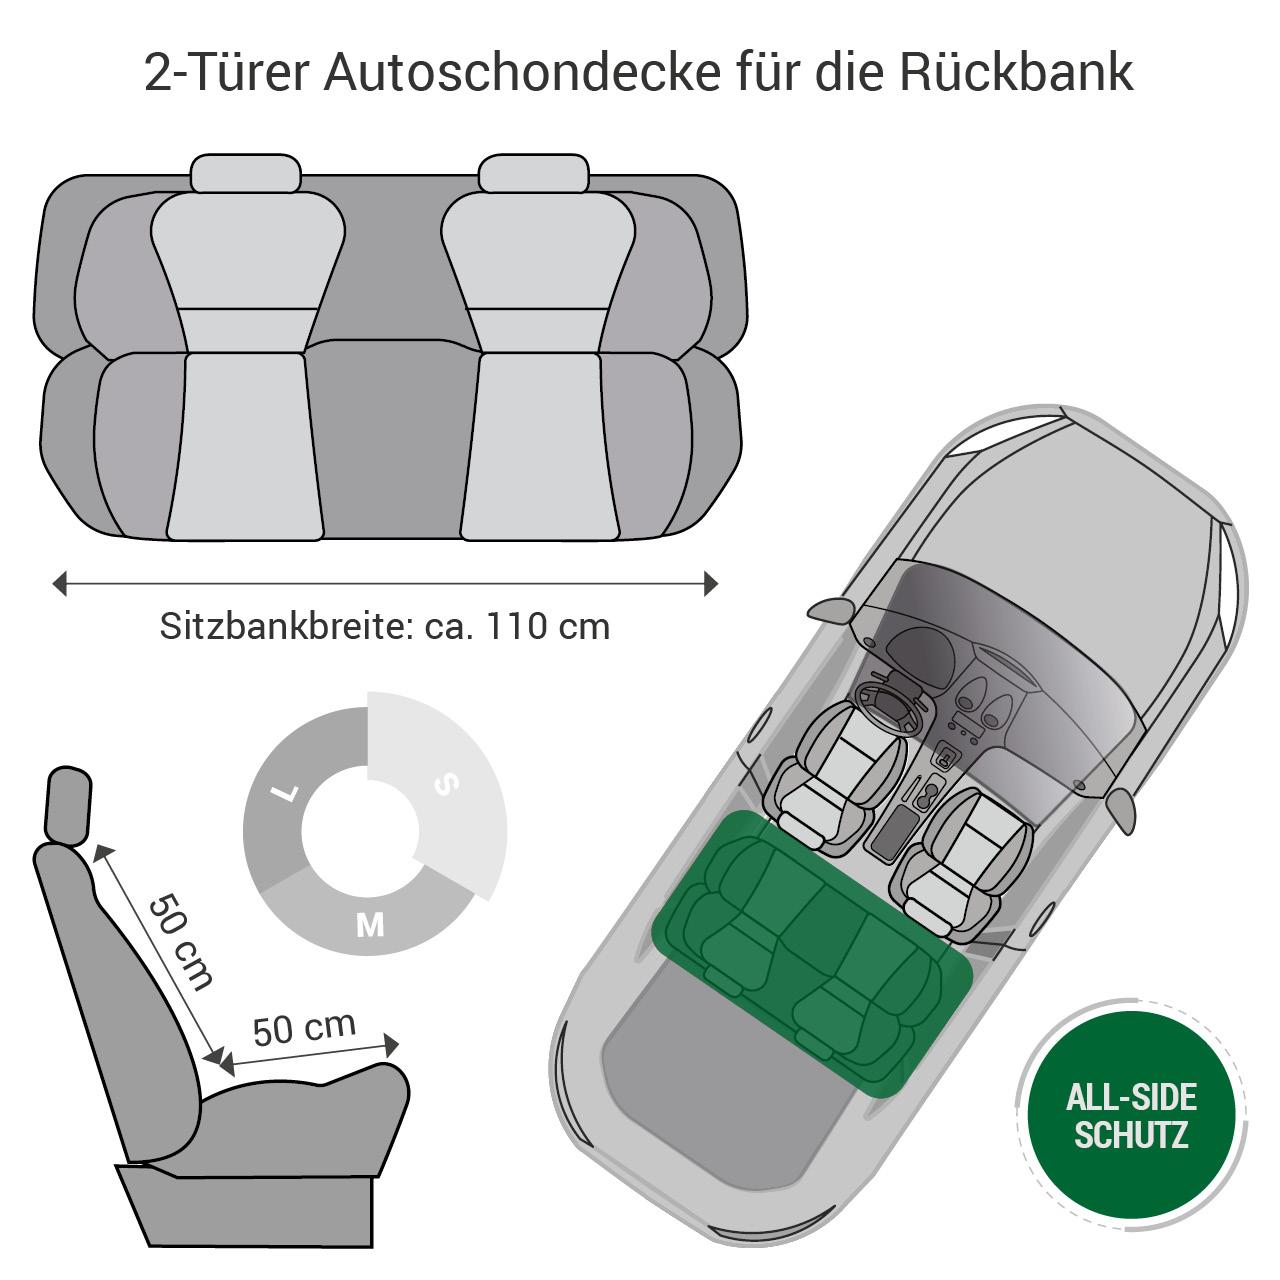 Doctor Bark - Autoschondecke für Hunde - Rückbank 2-Türer / Cabrio Gr. S - schwarz